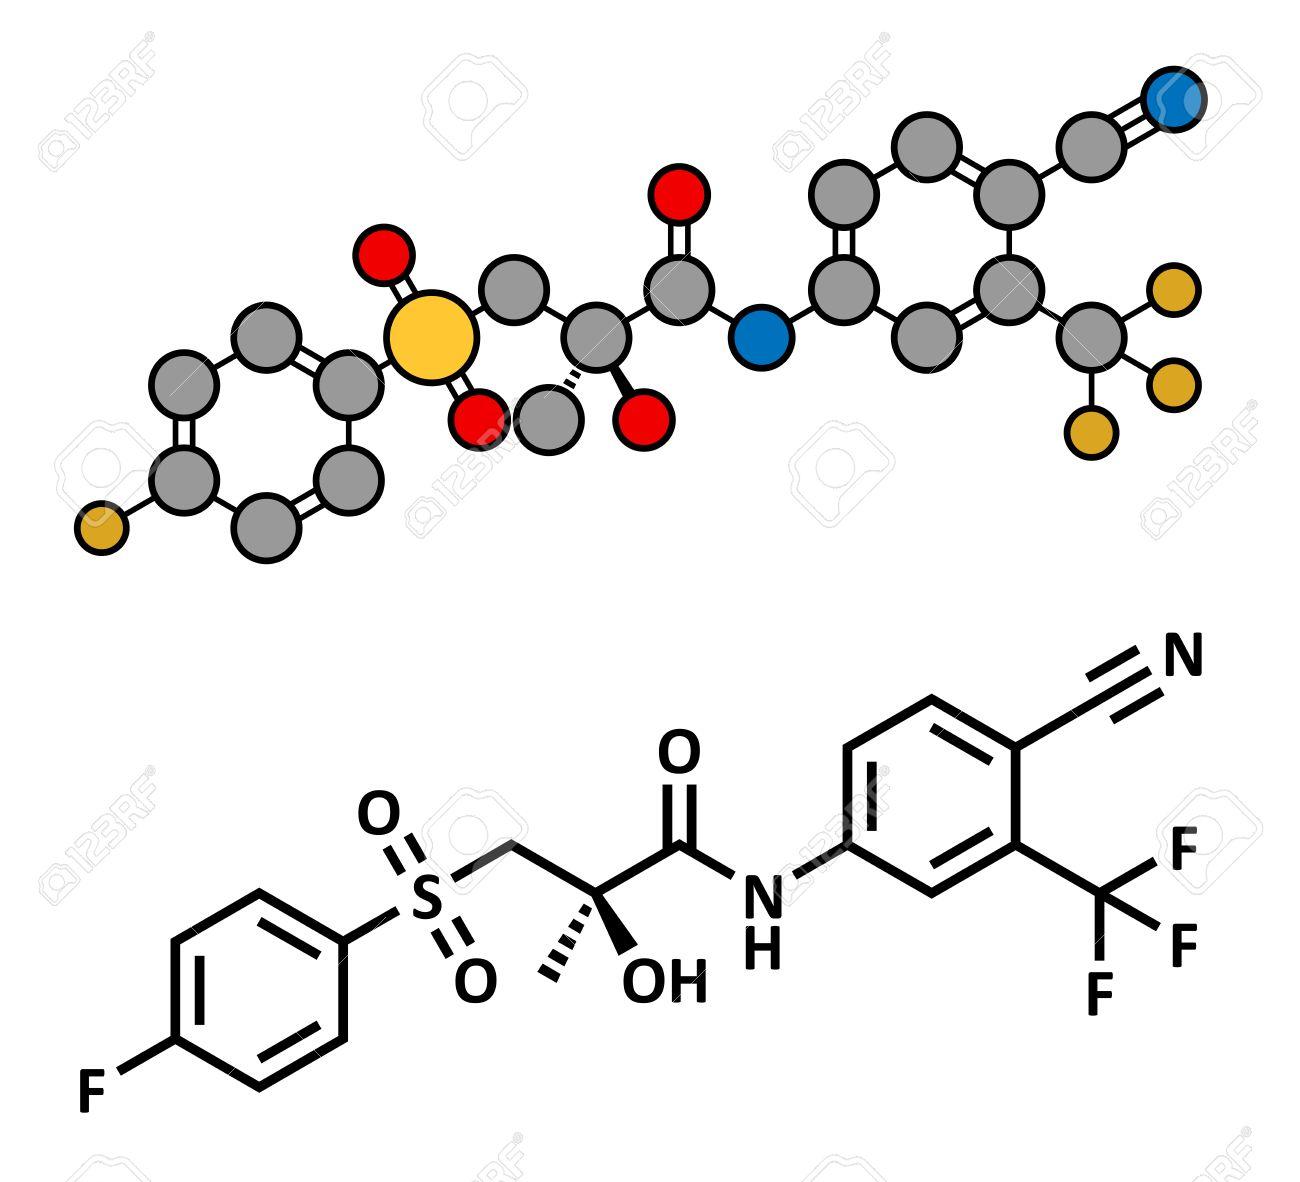 cáncer de próstata anti antiandrógenos